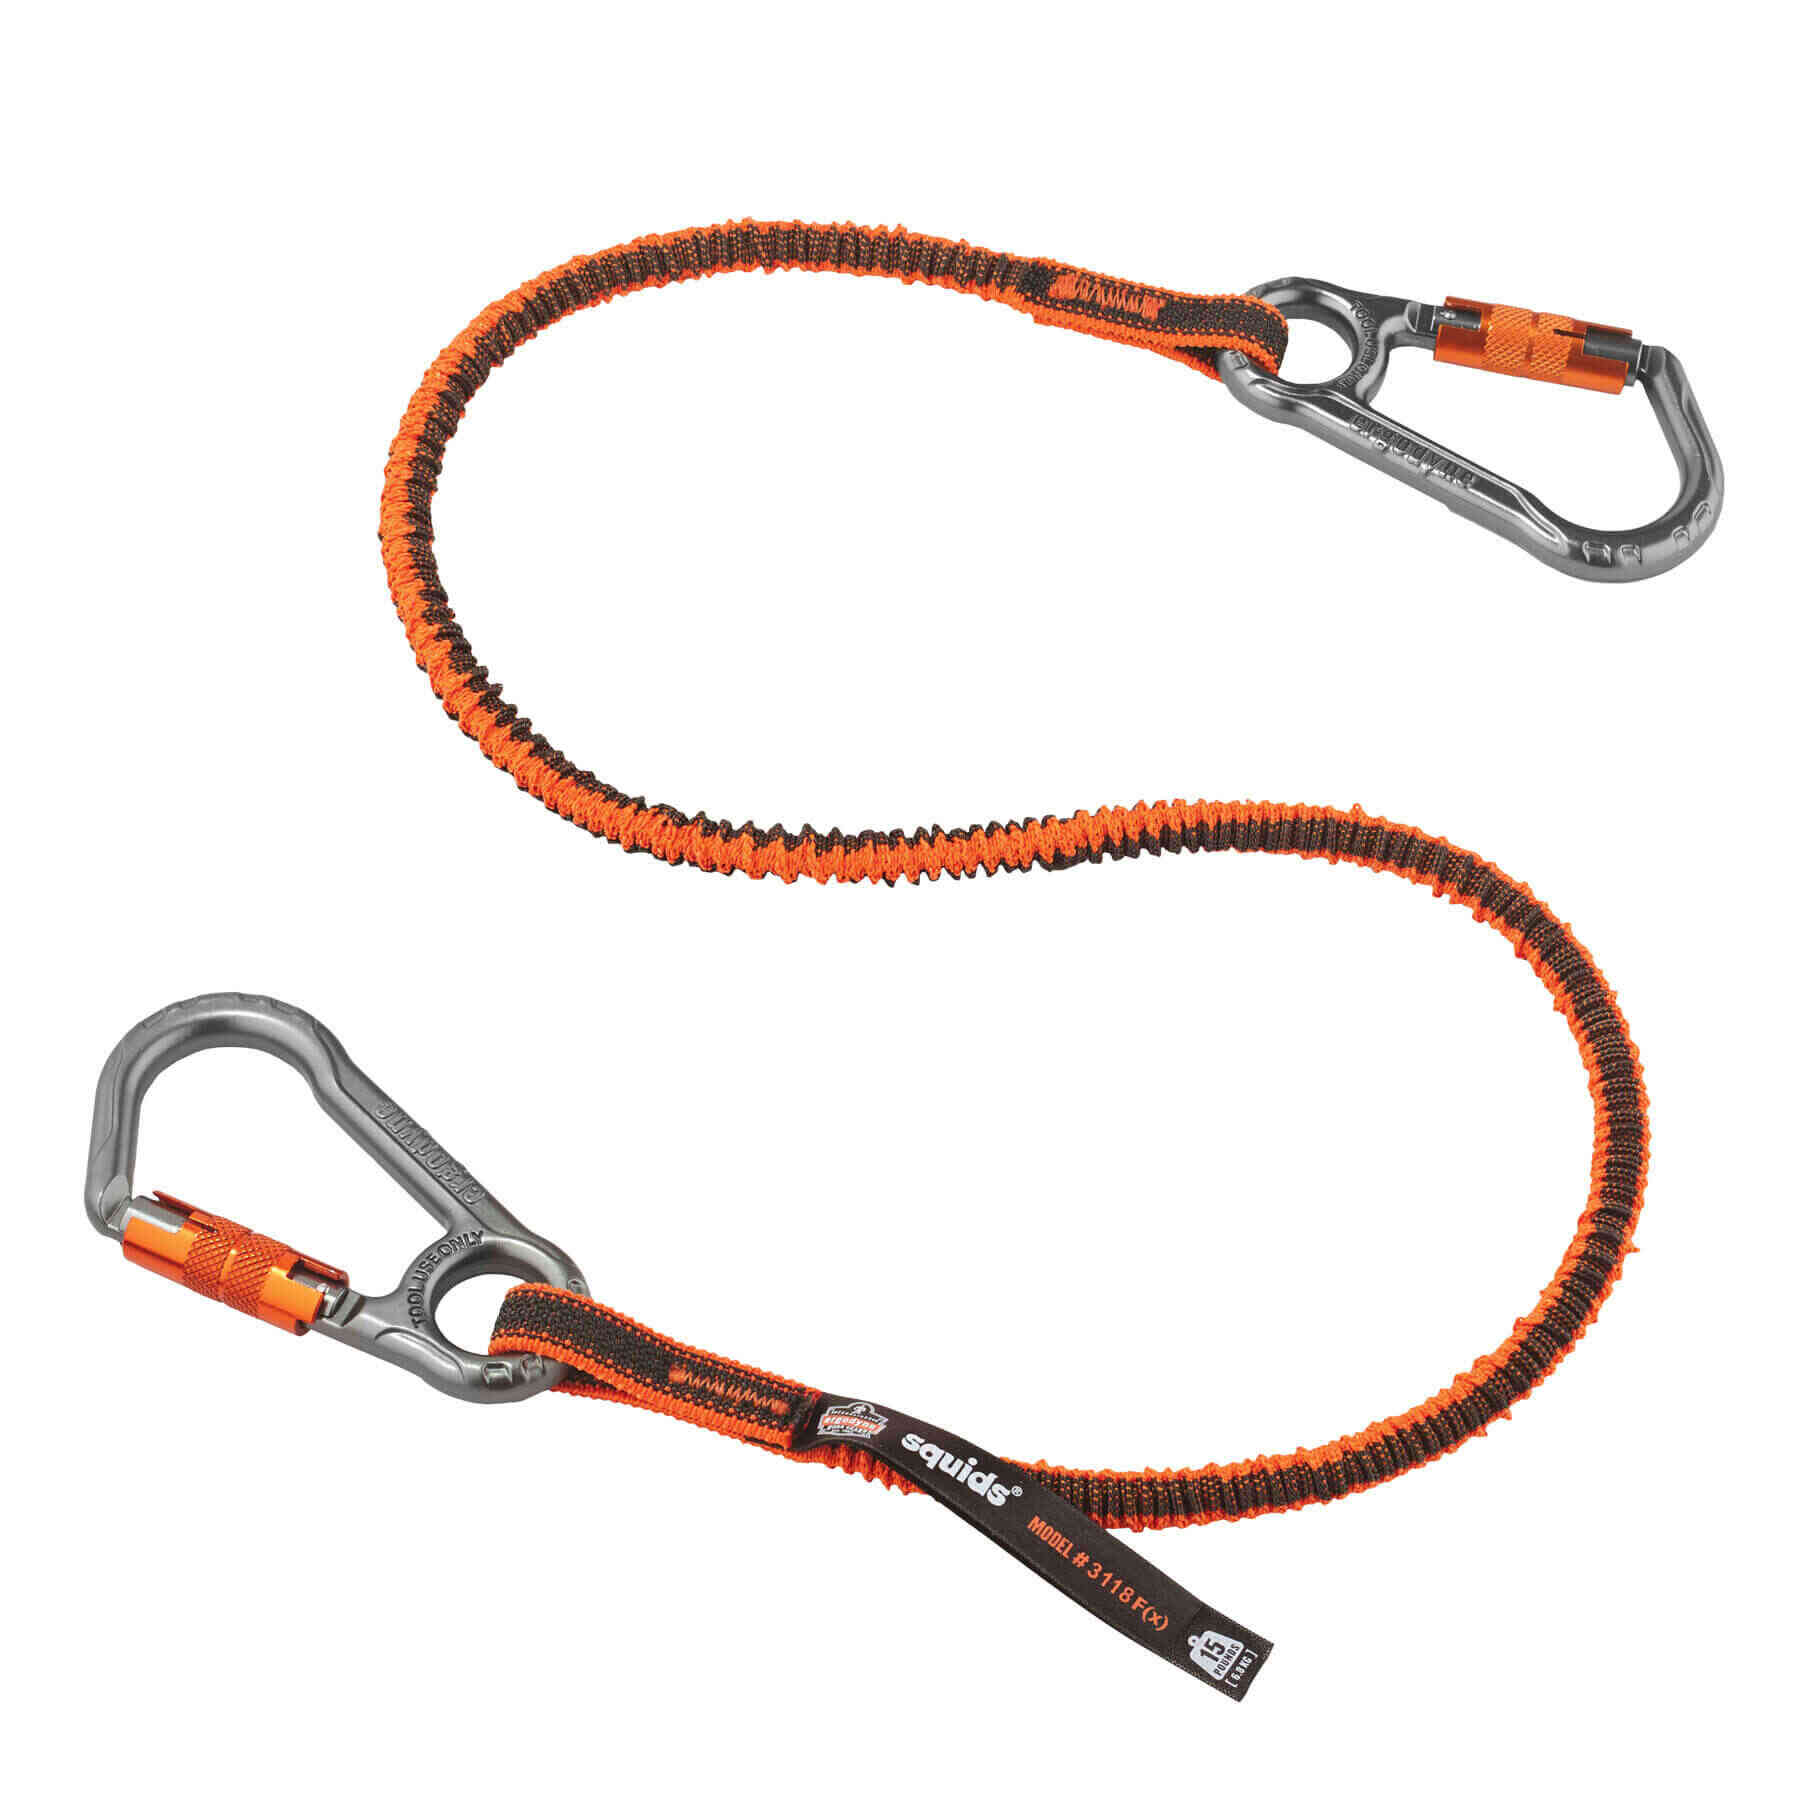 Squids® 3118F(x) Tool Lanyard Dual Locking Carabiner - 15lbs